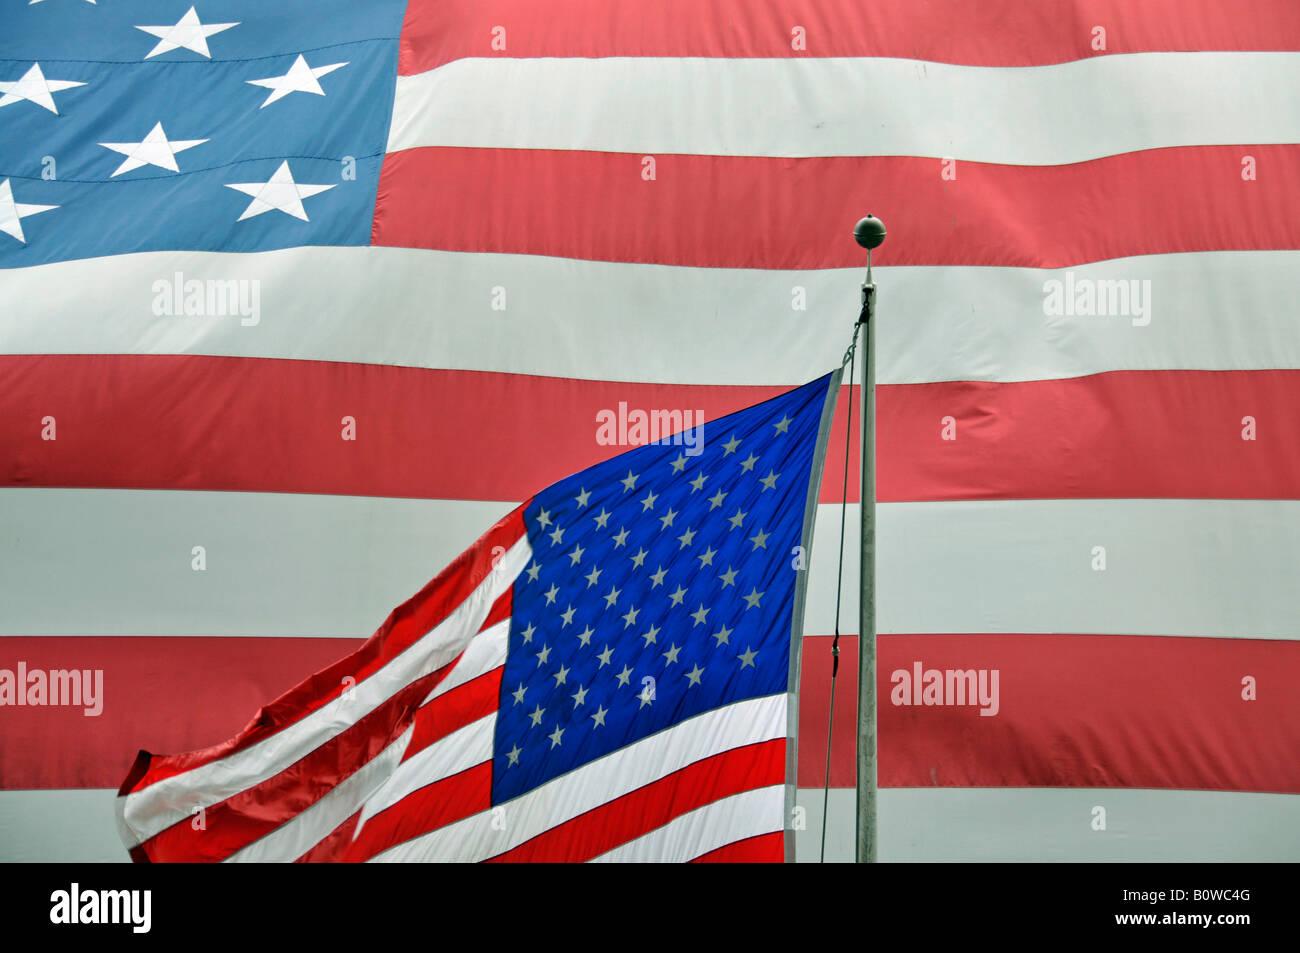 US flags, New York Stock Exchange, NYSE, Wall Street, Manhattan, New York City, USA - Stock Image